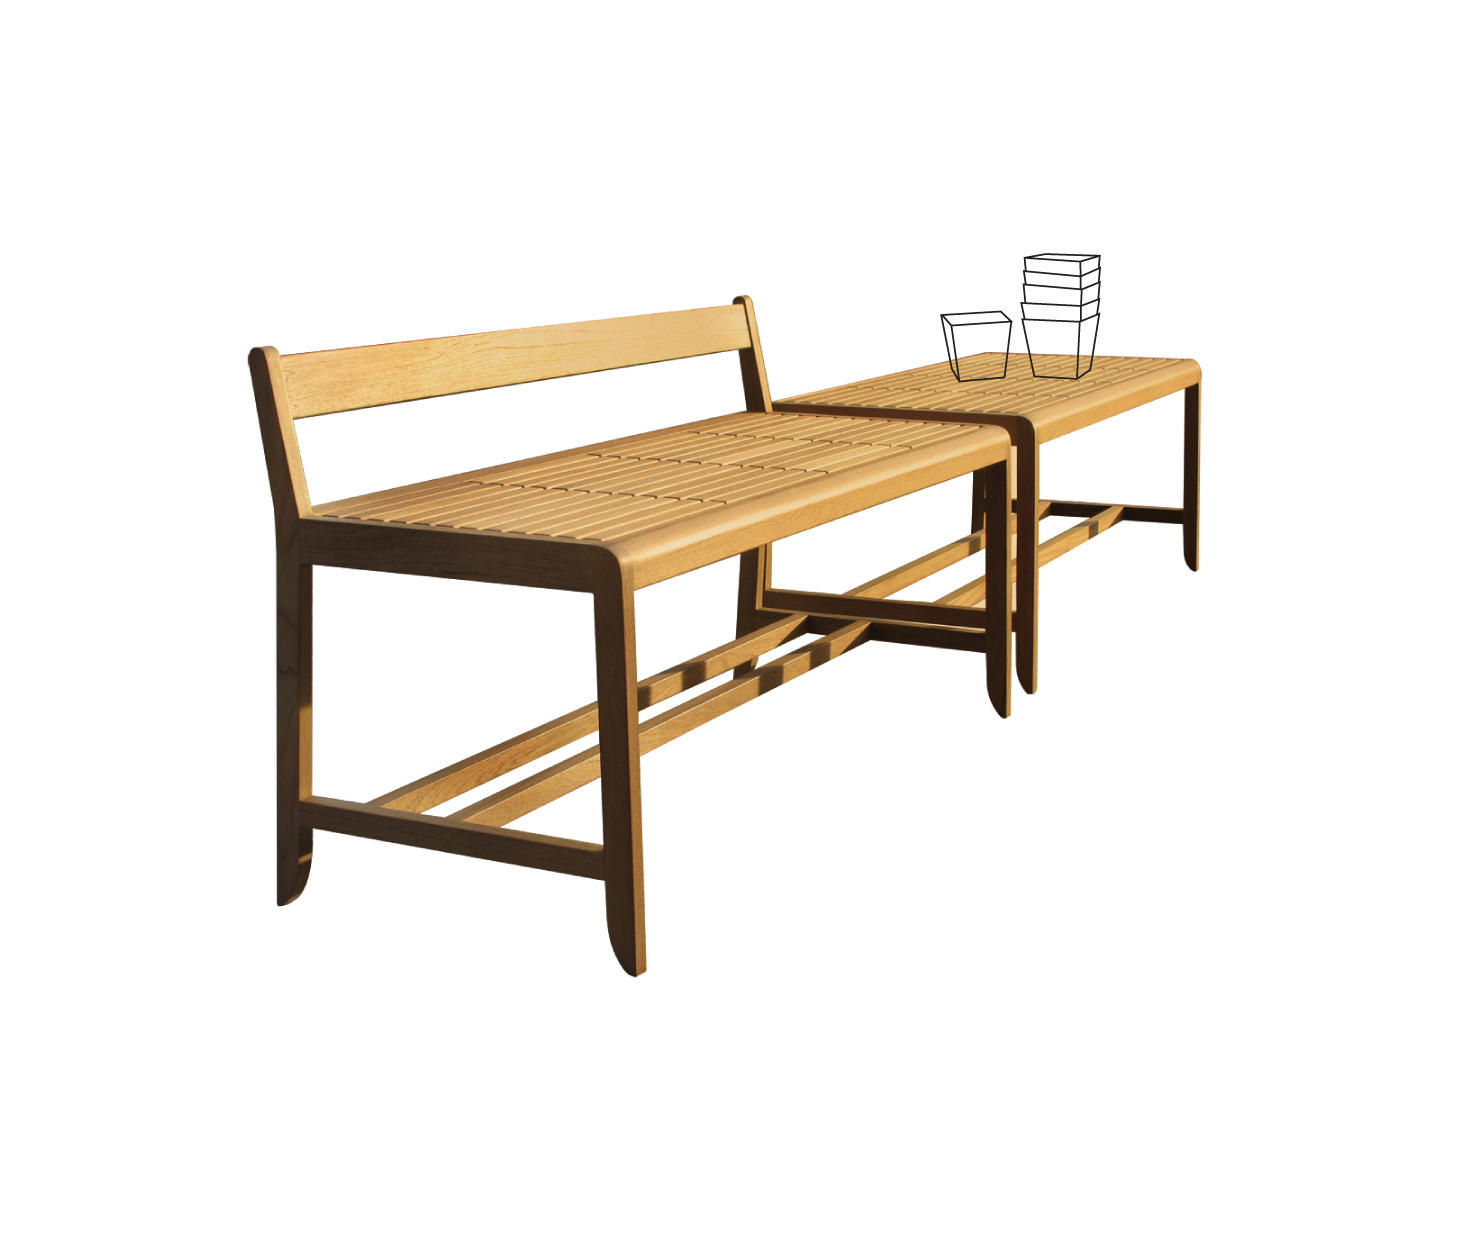 Saki bar stool garten barhocker von deesawat architonic for Barhocker englisch